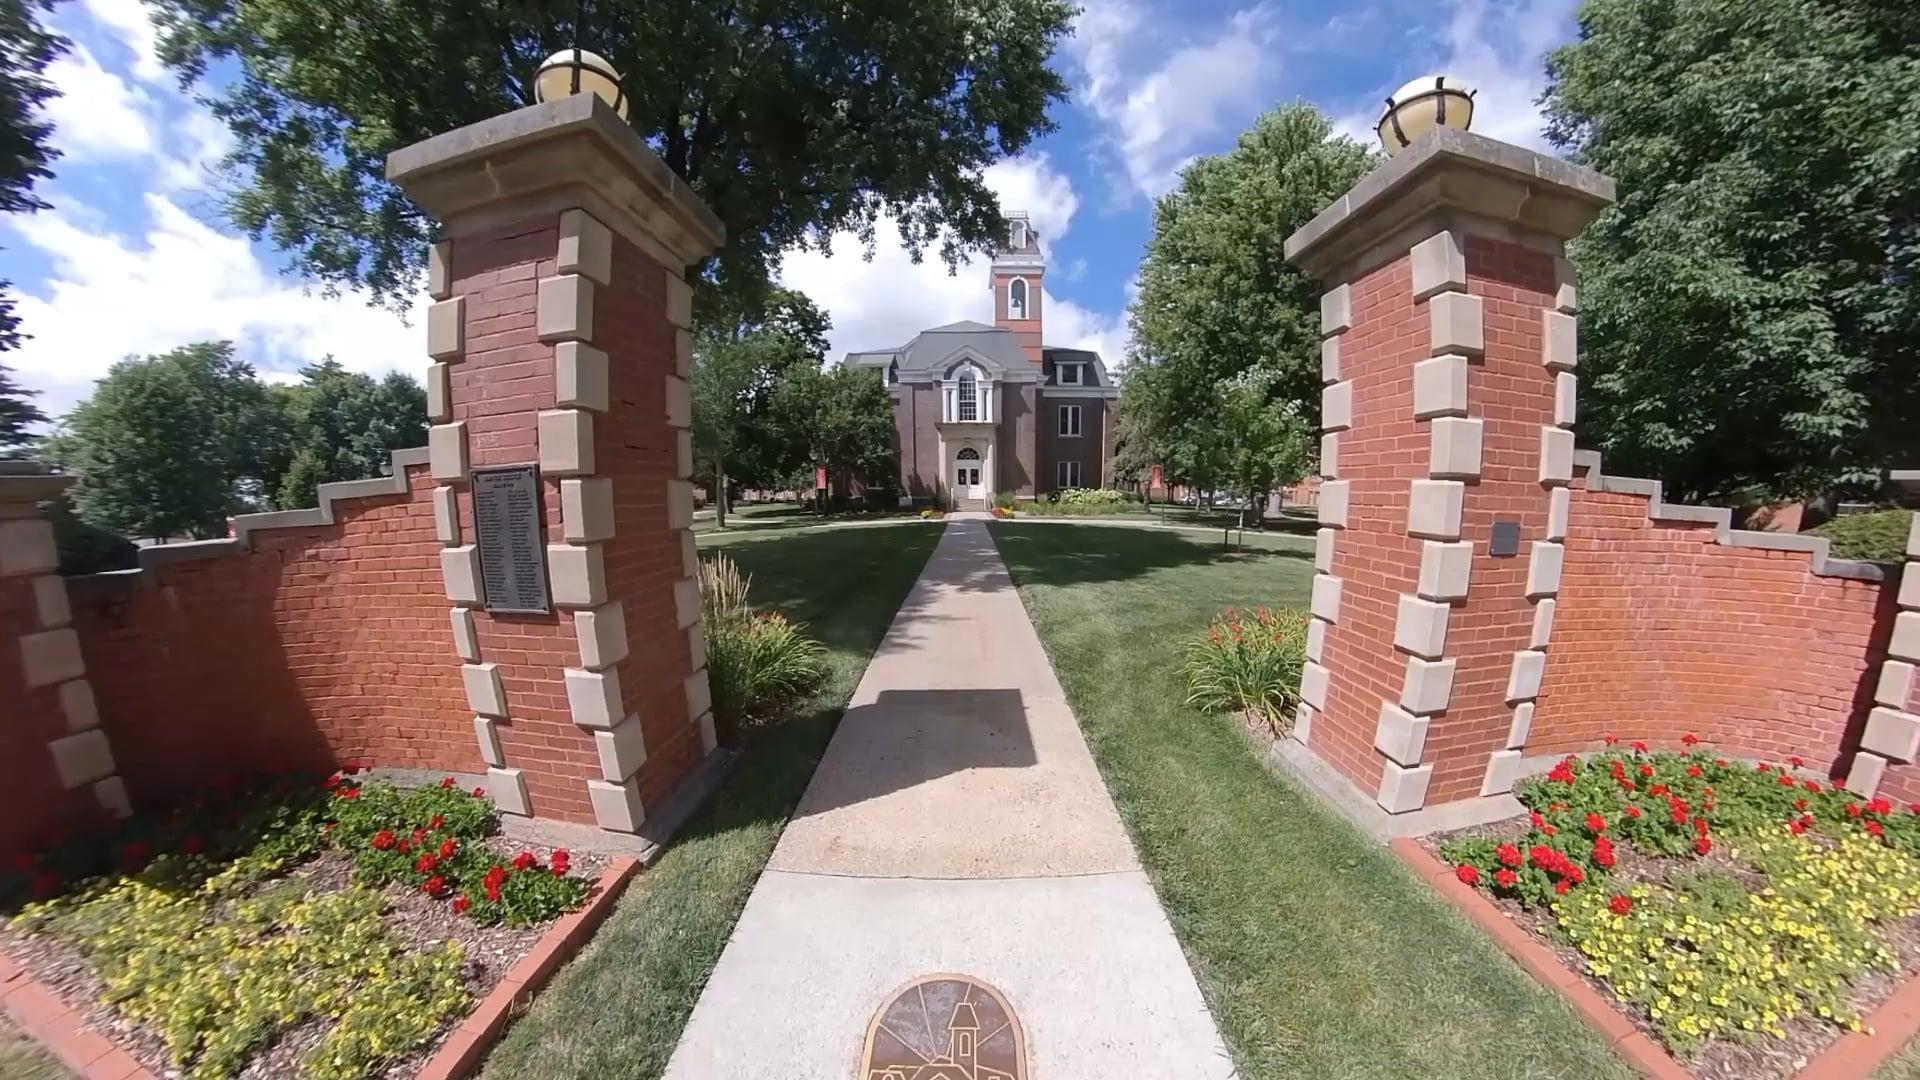 Virtual Tour | Simpson College Admissions